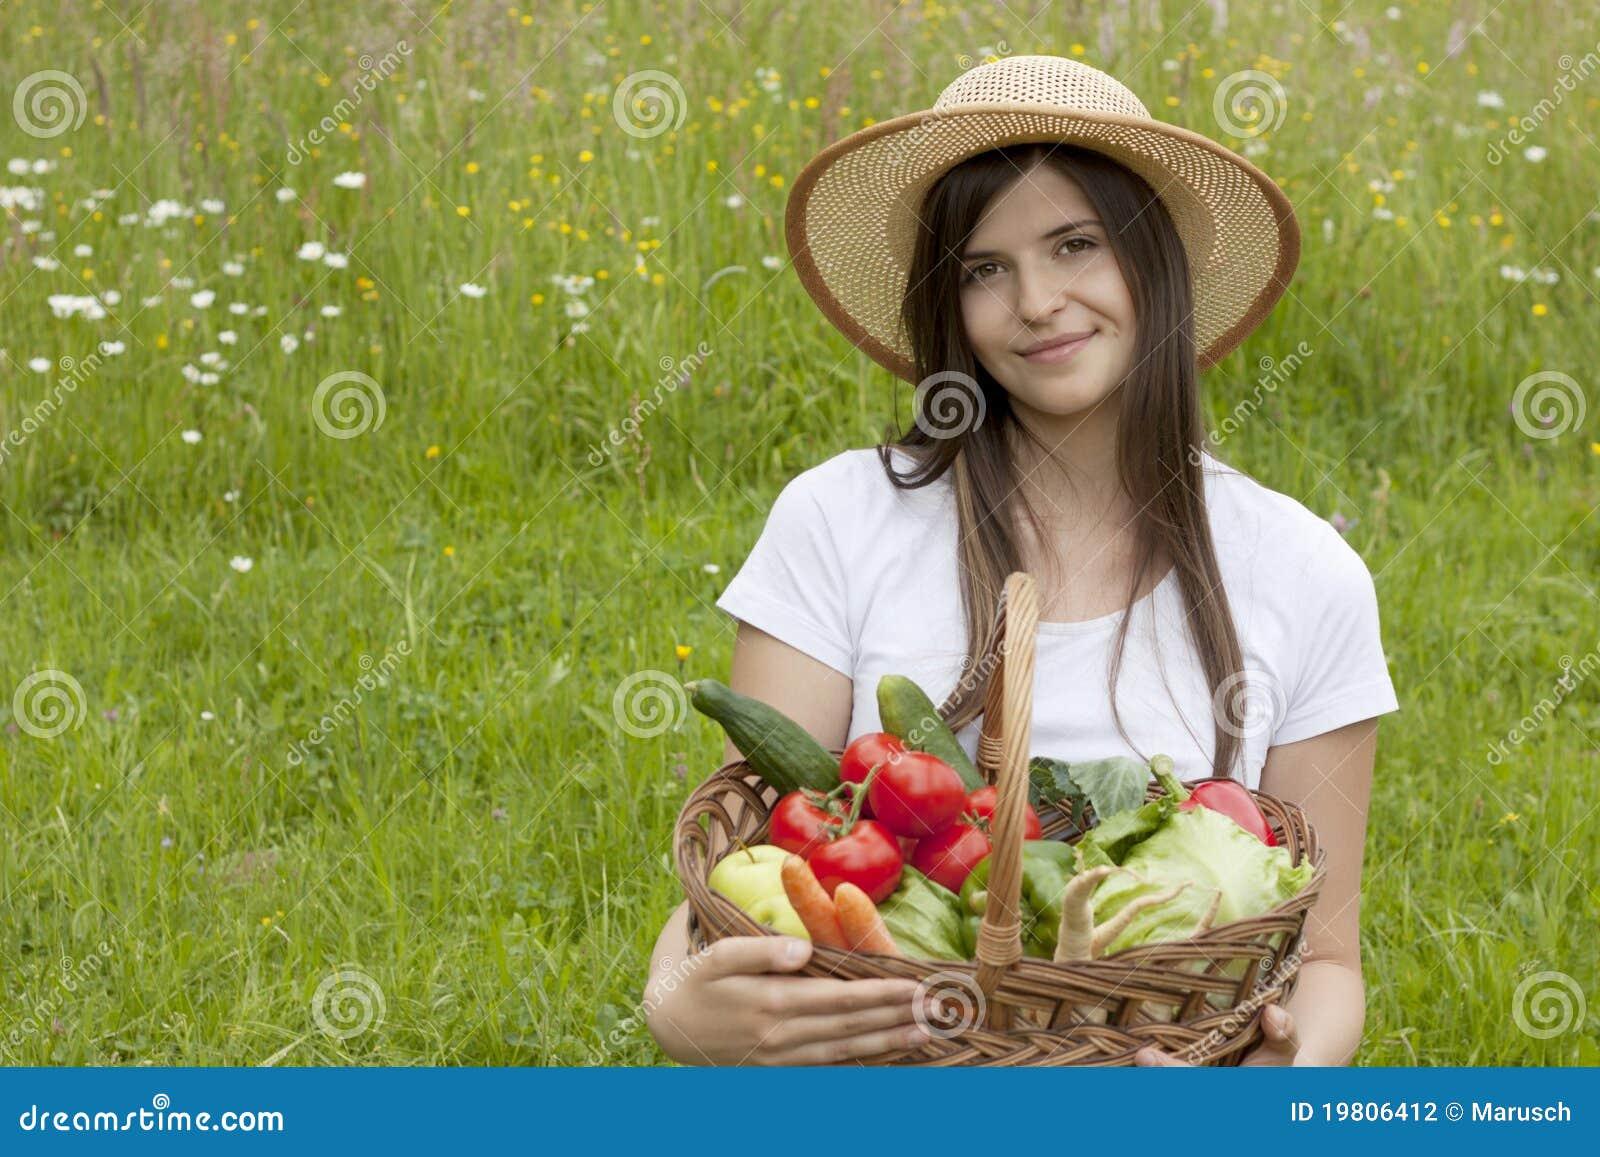 Beautiful Vegetable Garden Photography